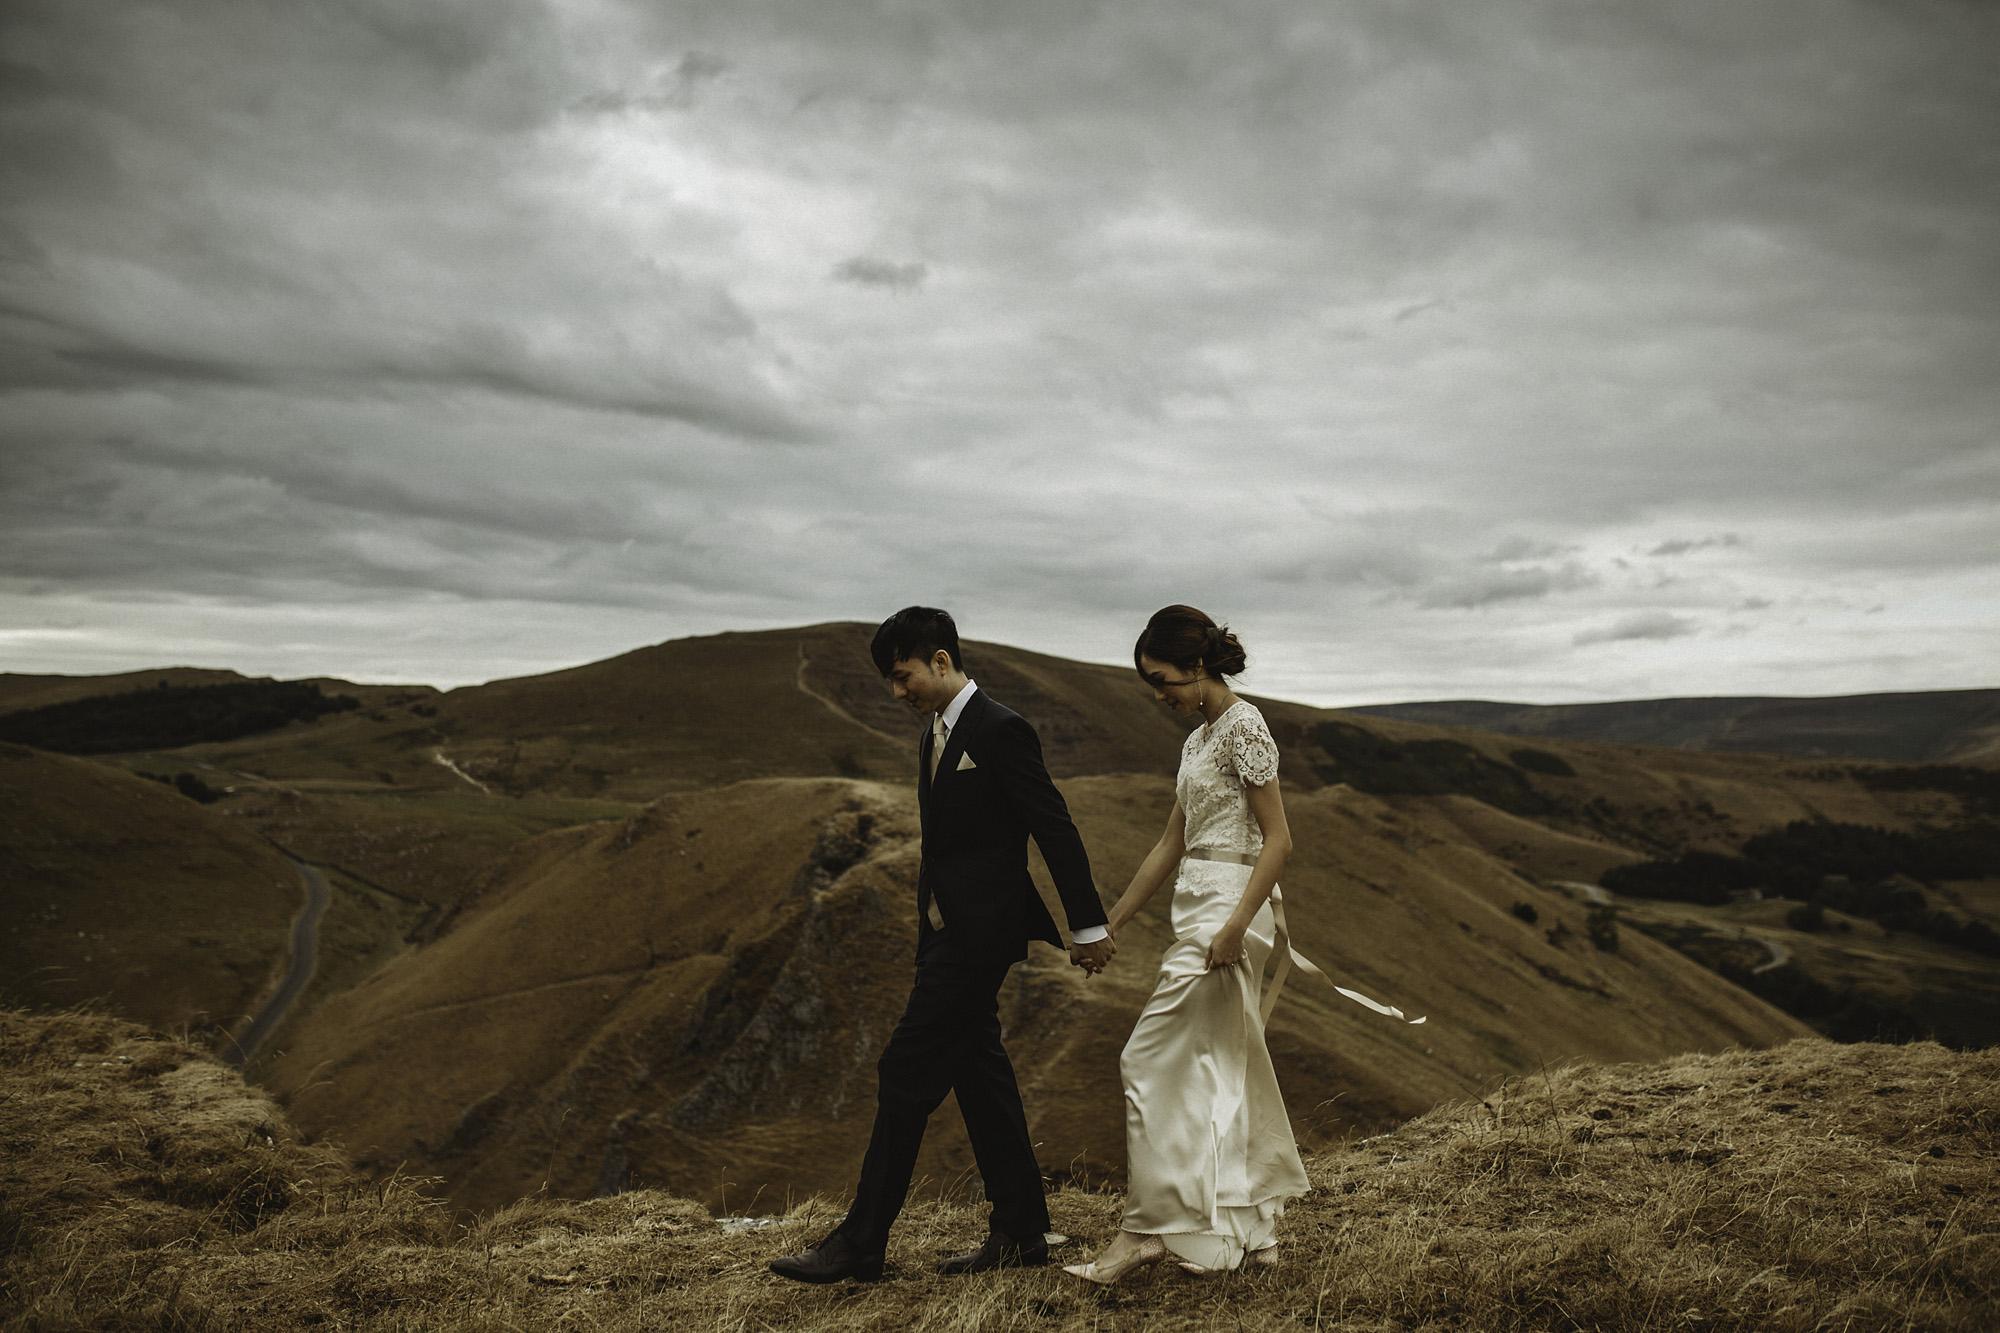 Kate-Beaumont-Wedding-Dress-Bridal-Separates-Peak-District-Shoot-12.jpg